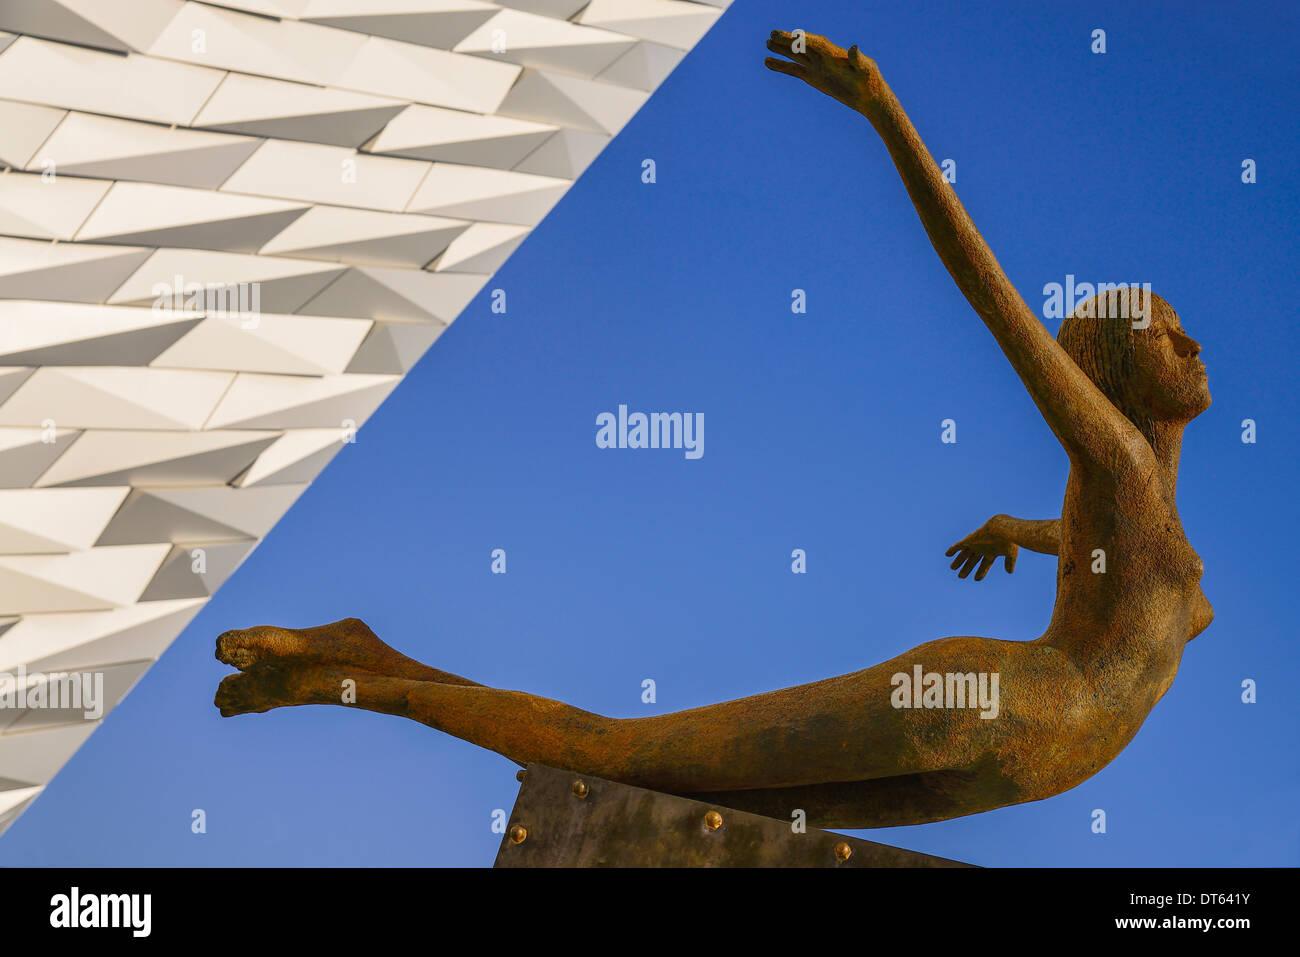 Ireland, Belfast, Titanic Quarter, Titanic Belfast Visitor Experience, Titanica sculpture by Rowan Gillespie against Stock Photo